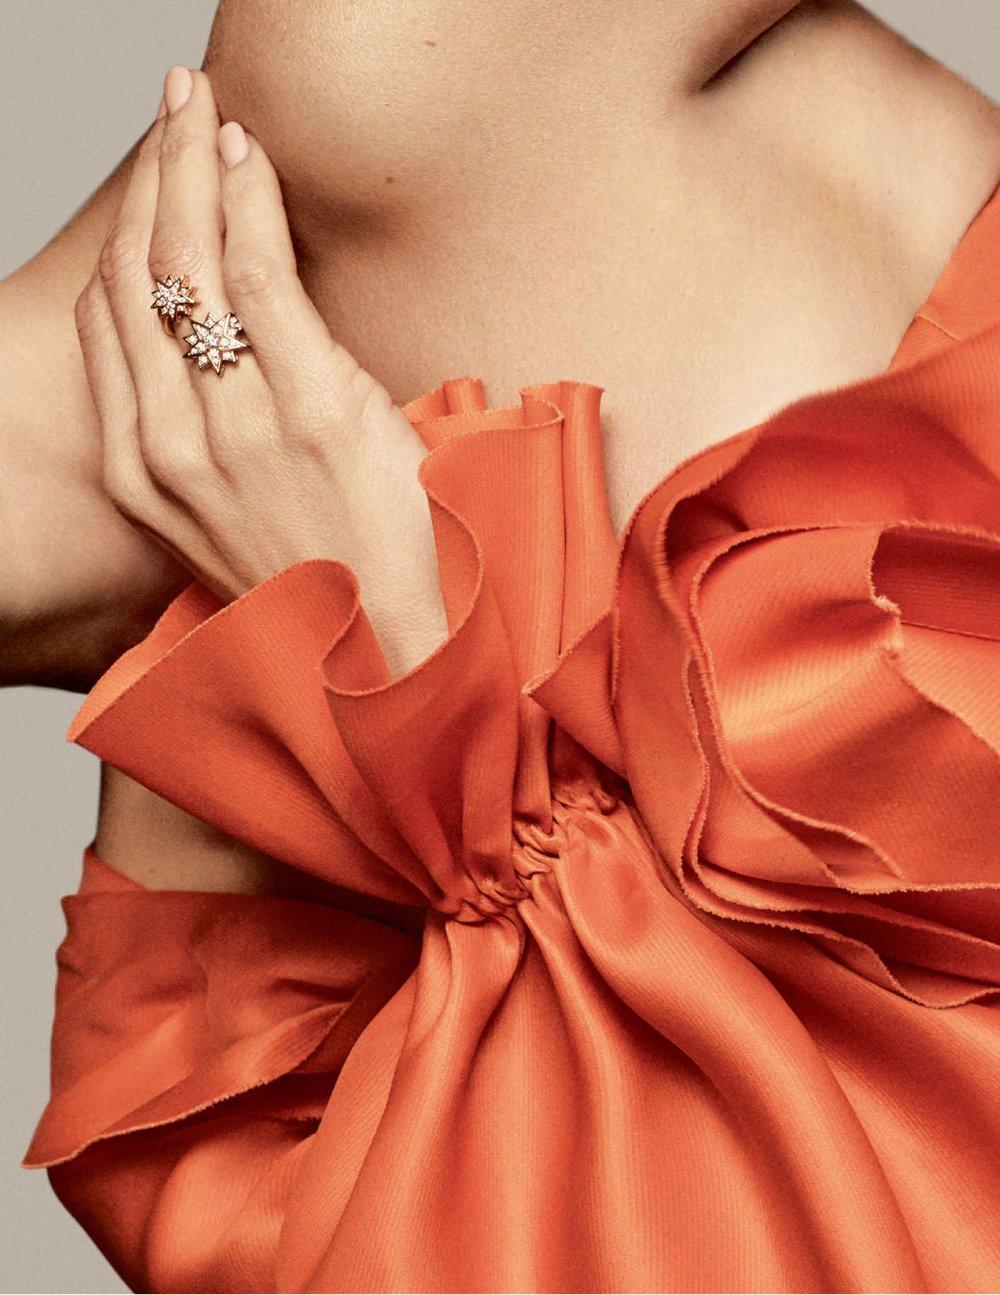 Penelope-Cruz-Luigi-Iango-Vogue-Spain-April-2019- (10).jpg